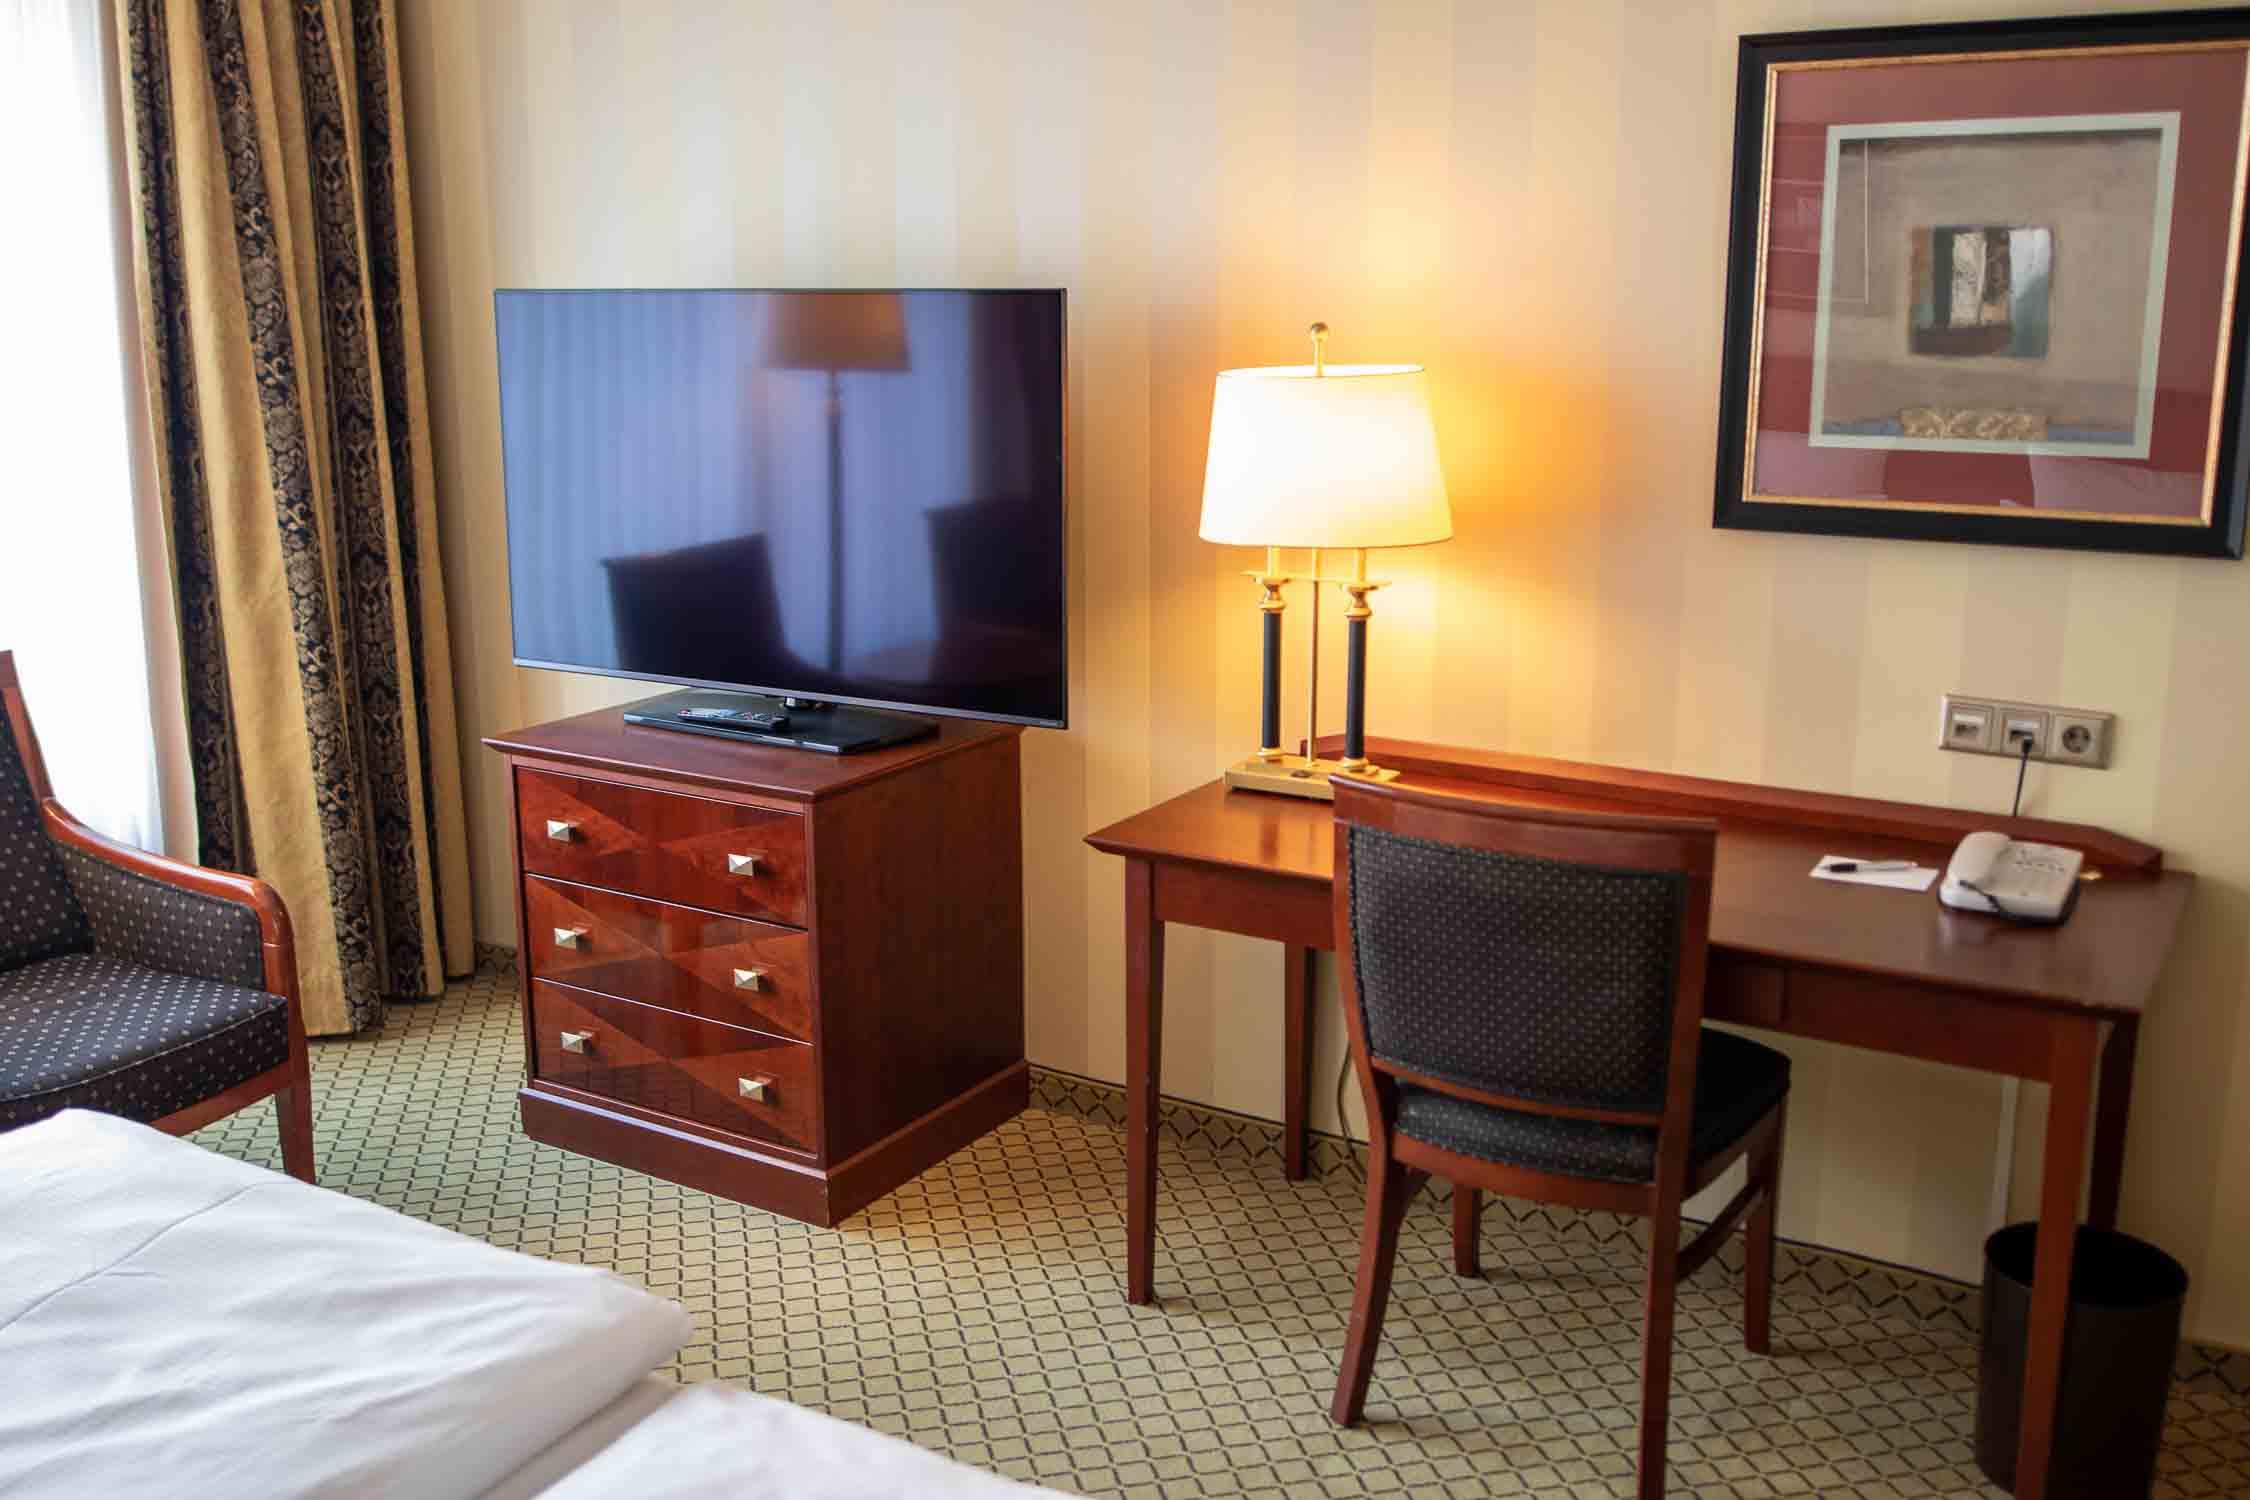 Zimmer JW Marriott Hotel Berlin Erfahrungsbericht